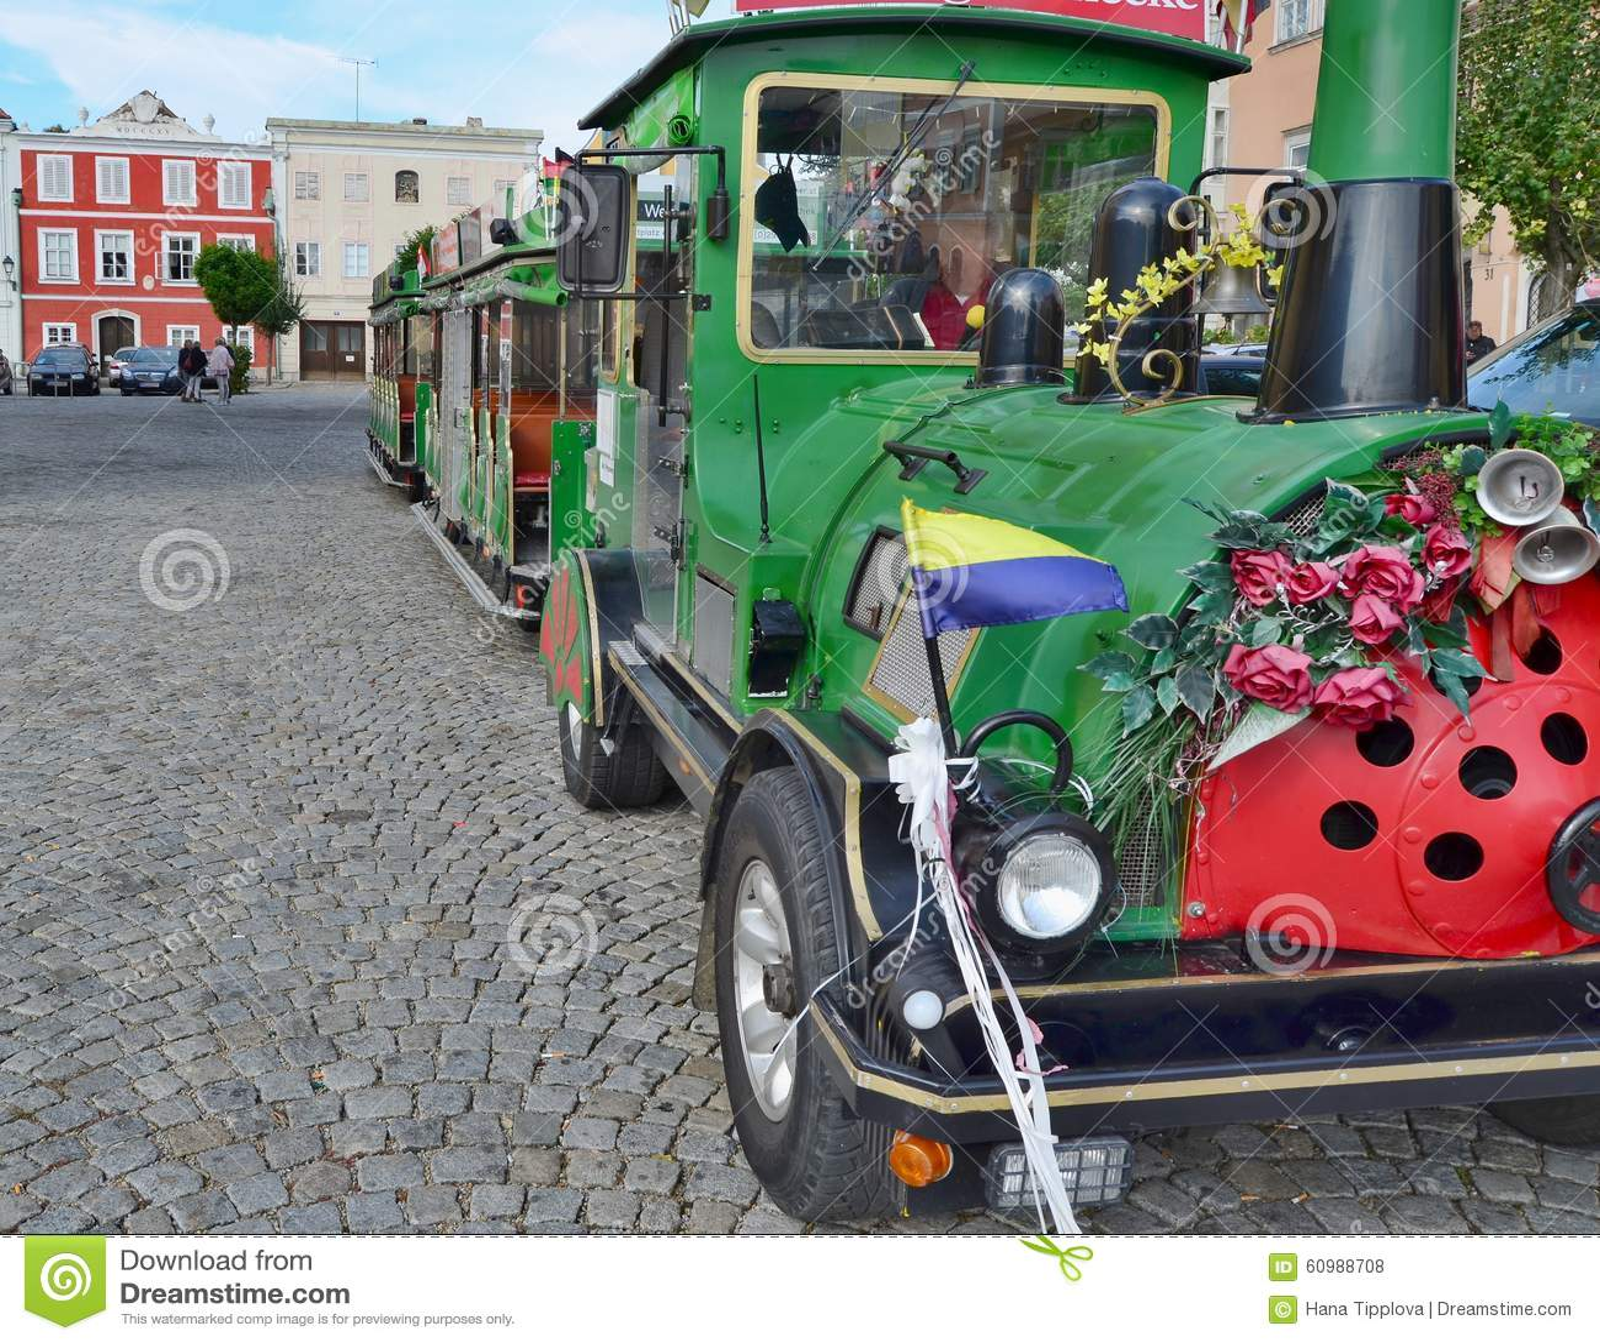 Cruise tourist train. Retz city